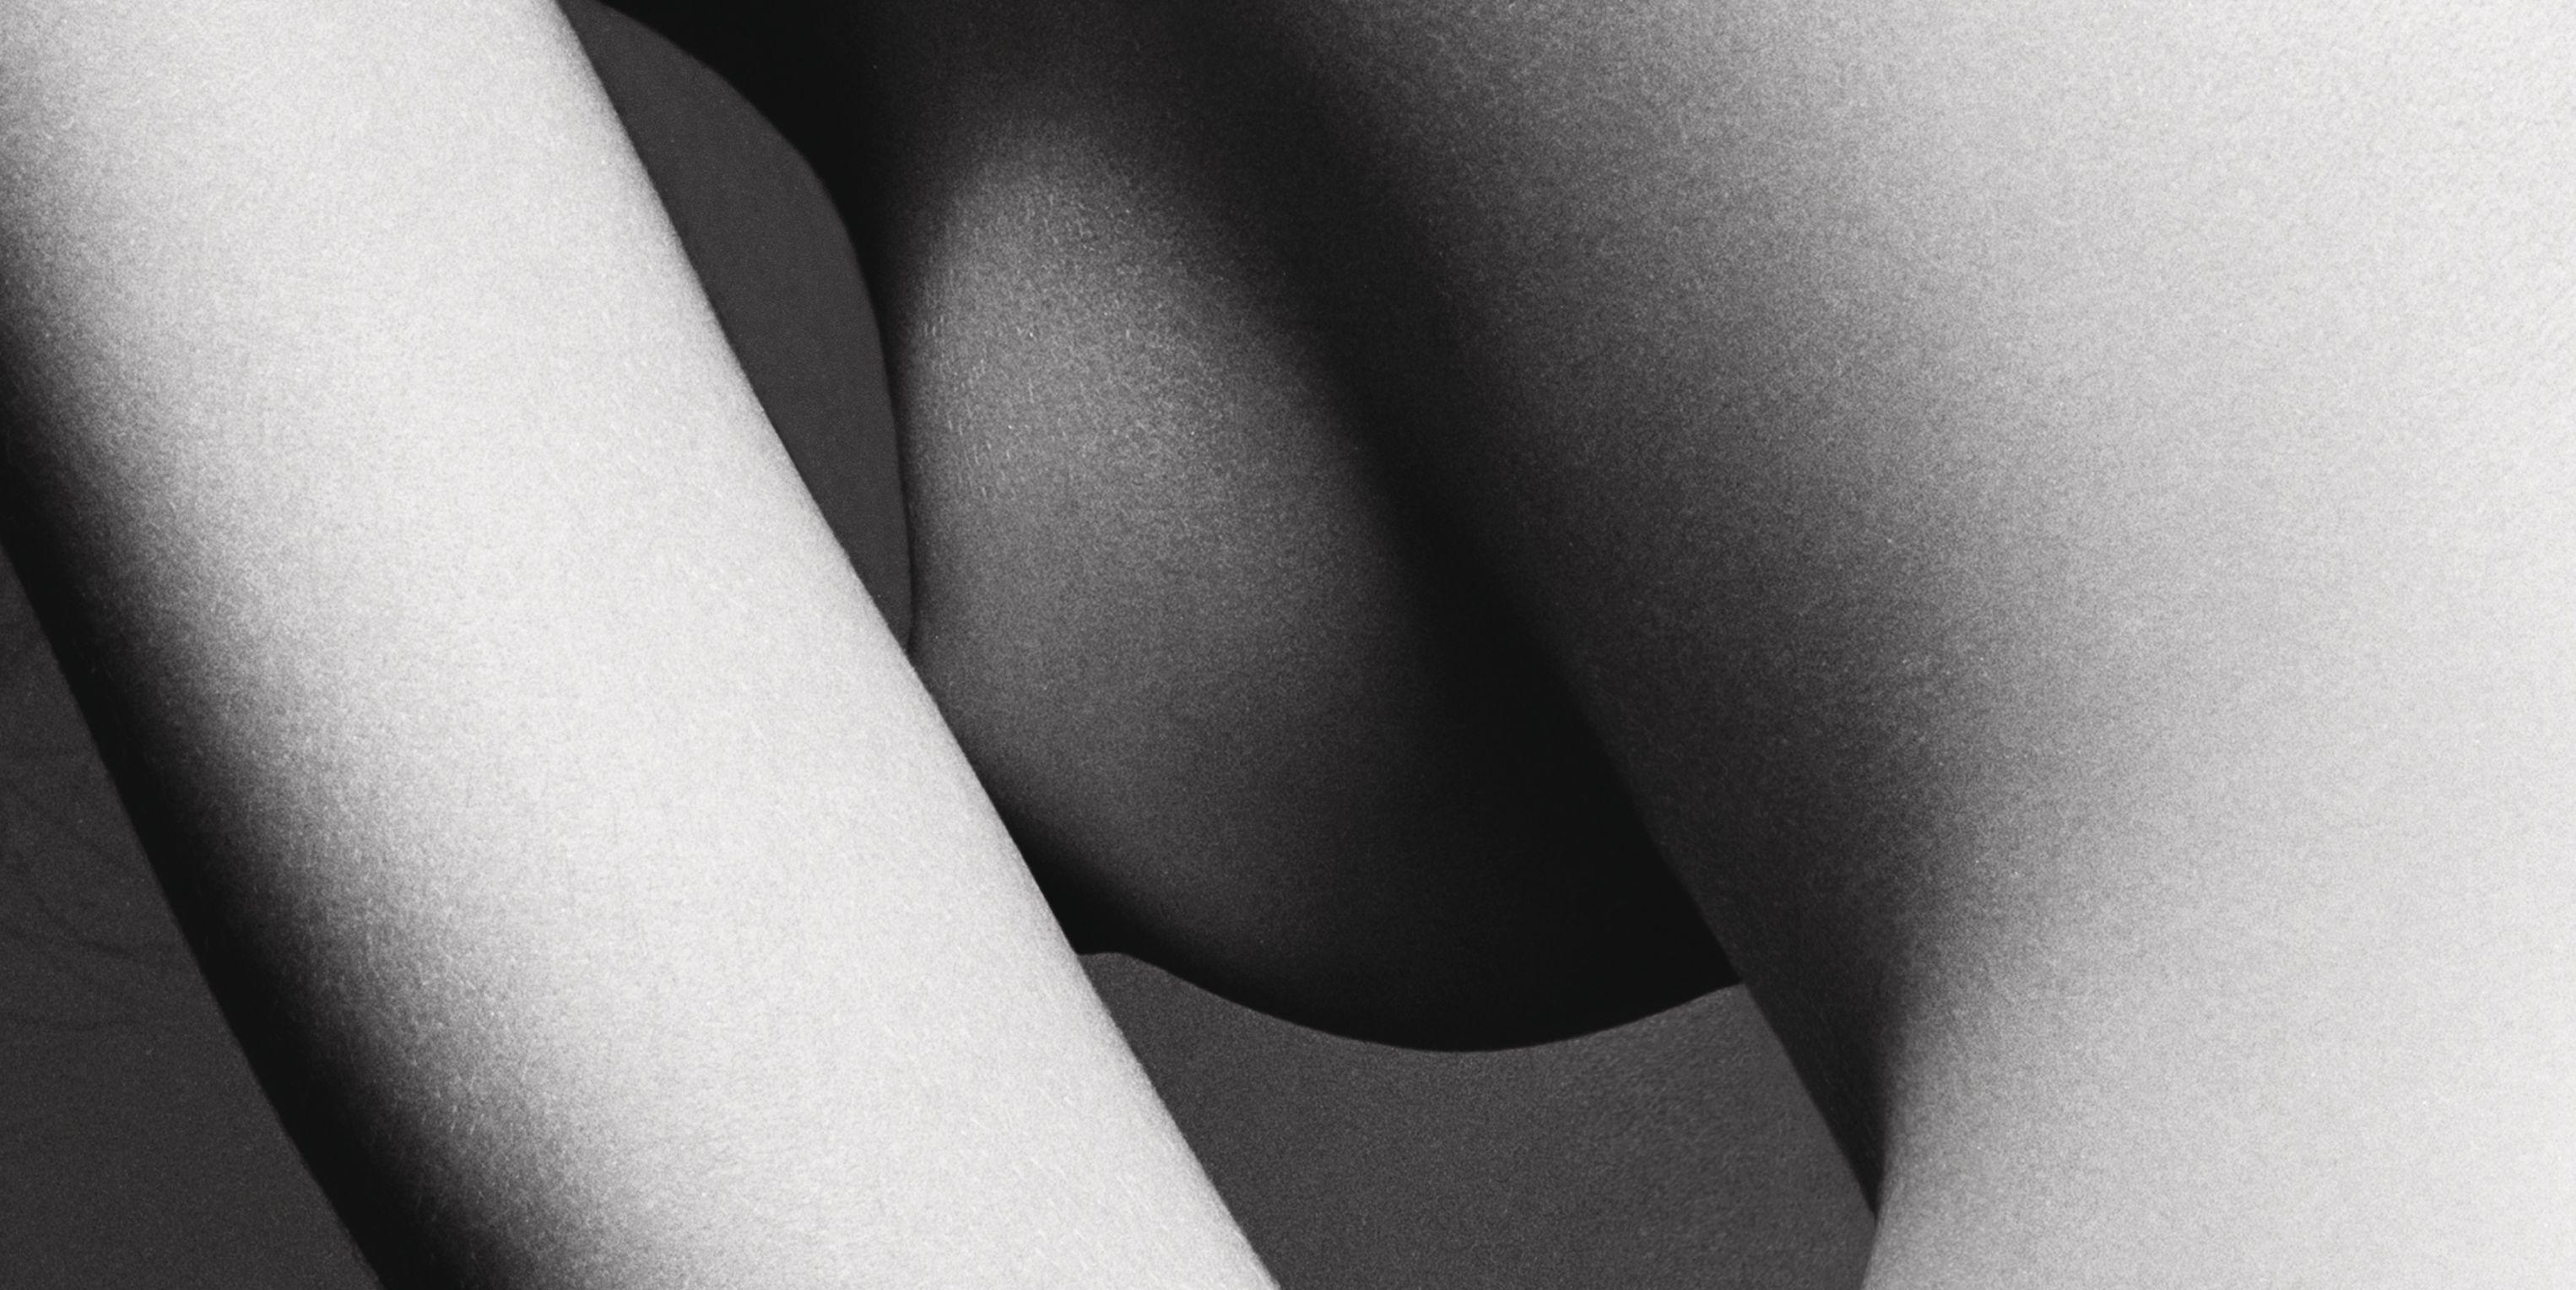 Assia Grazioli-Venier Breast Cancer Essay - Harper's BAZAAR Breast Cancer Essay October 2018